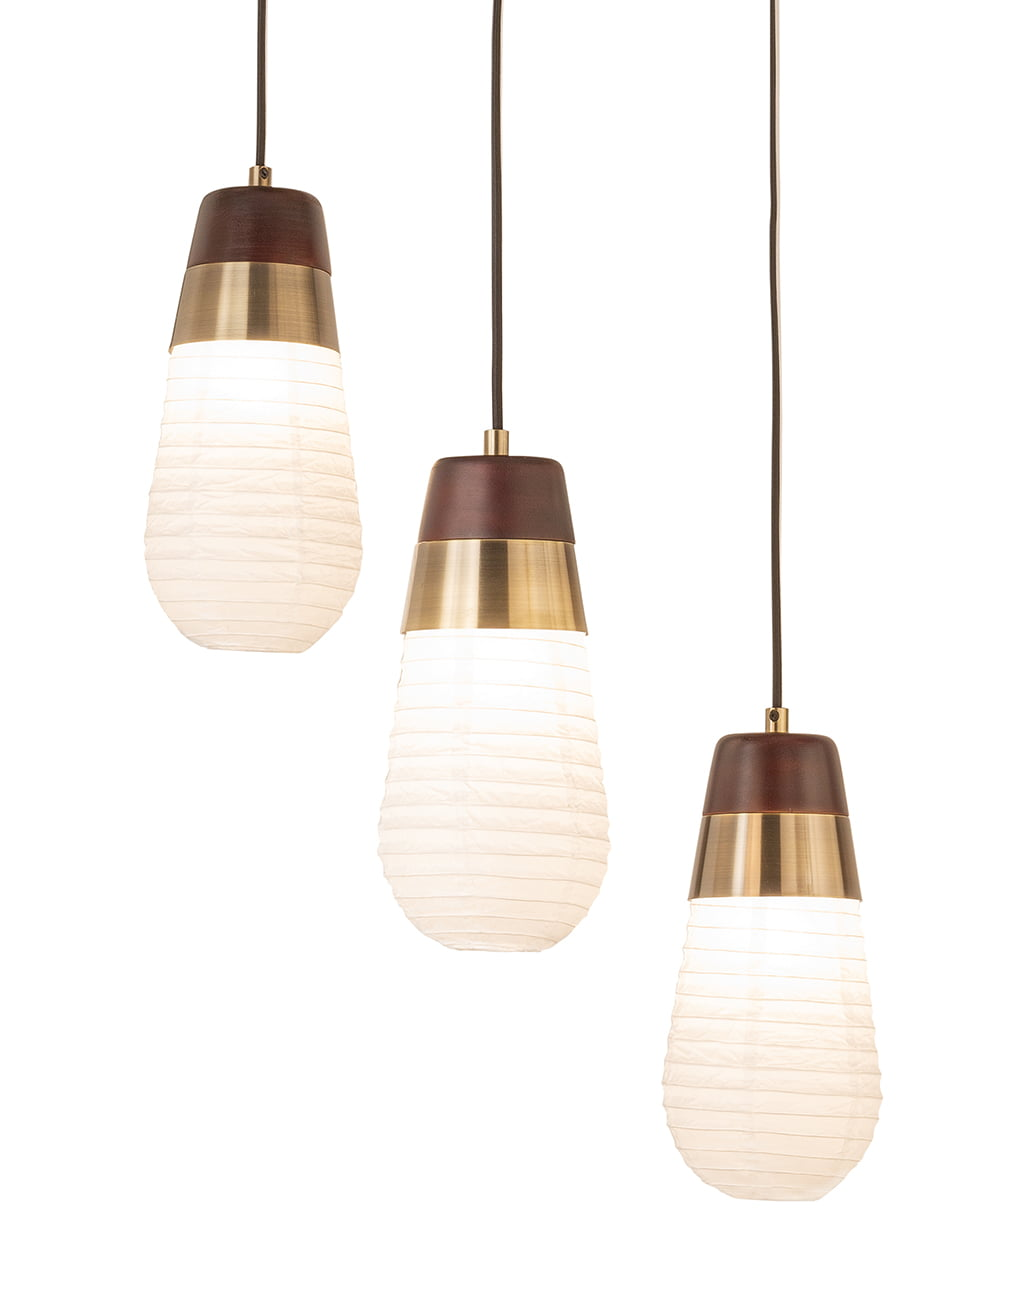 Sunset 3-Light Pendant Lamp, Weathered Brass